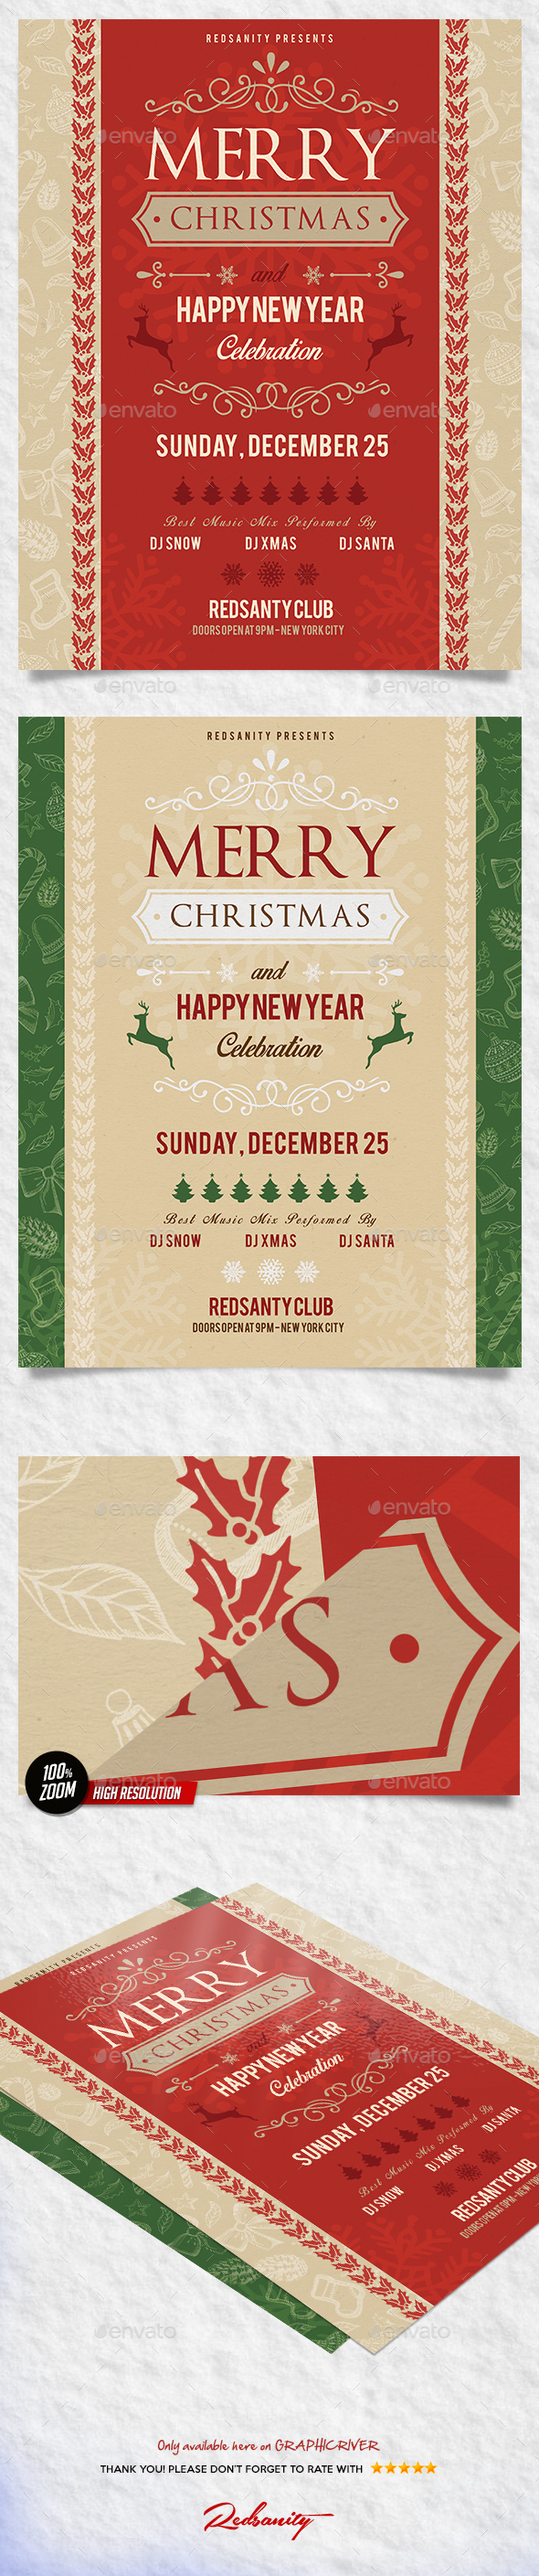 Christmas Flyer V2 - Holidays Events